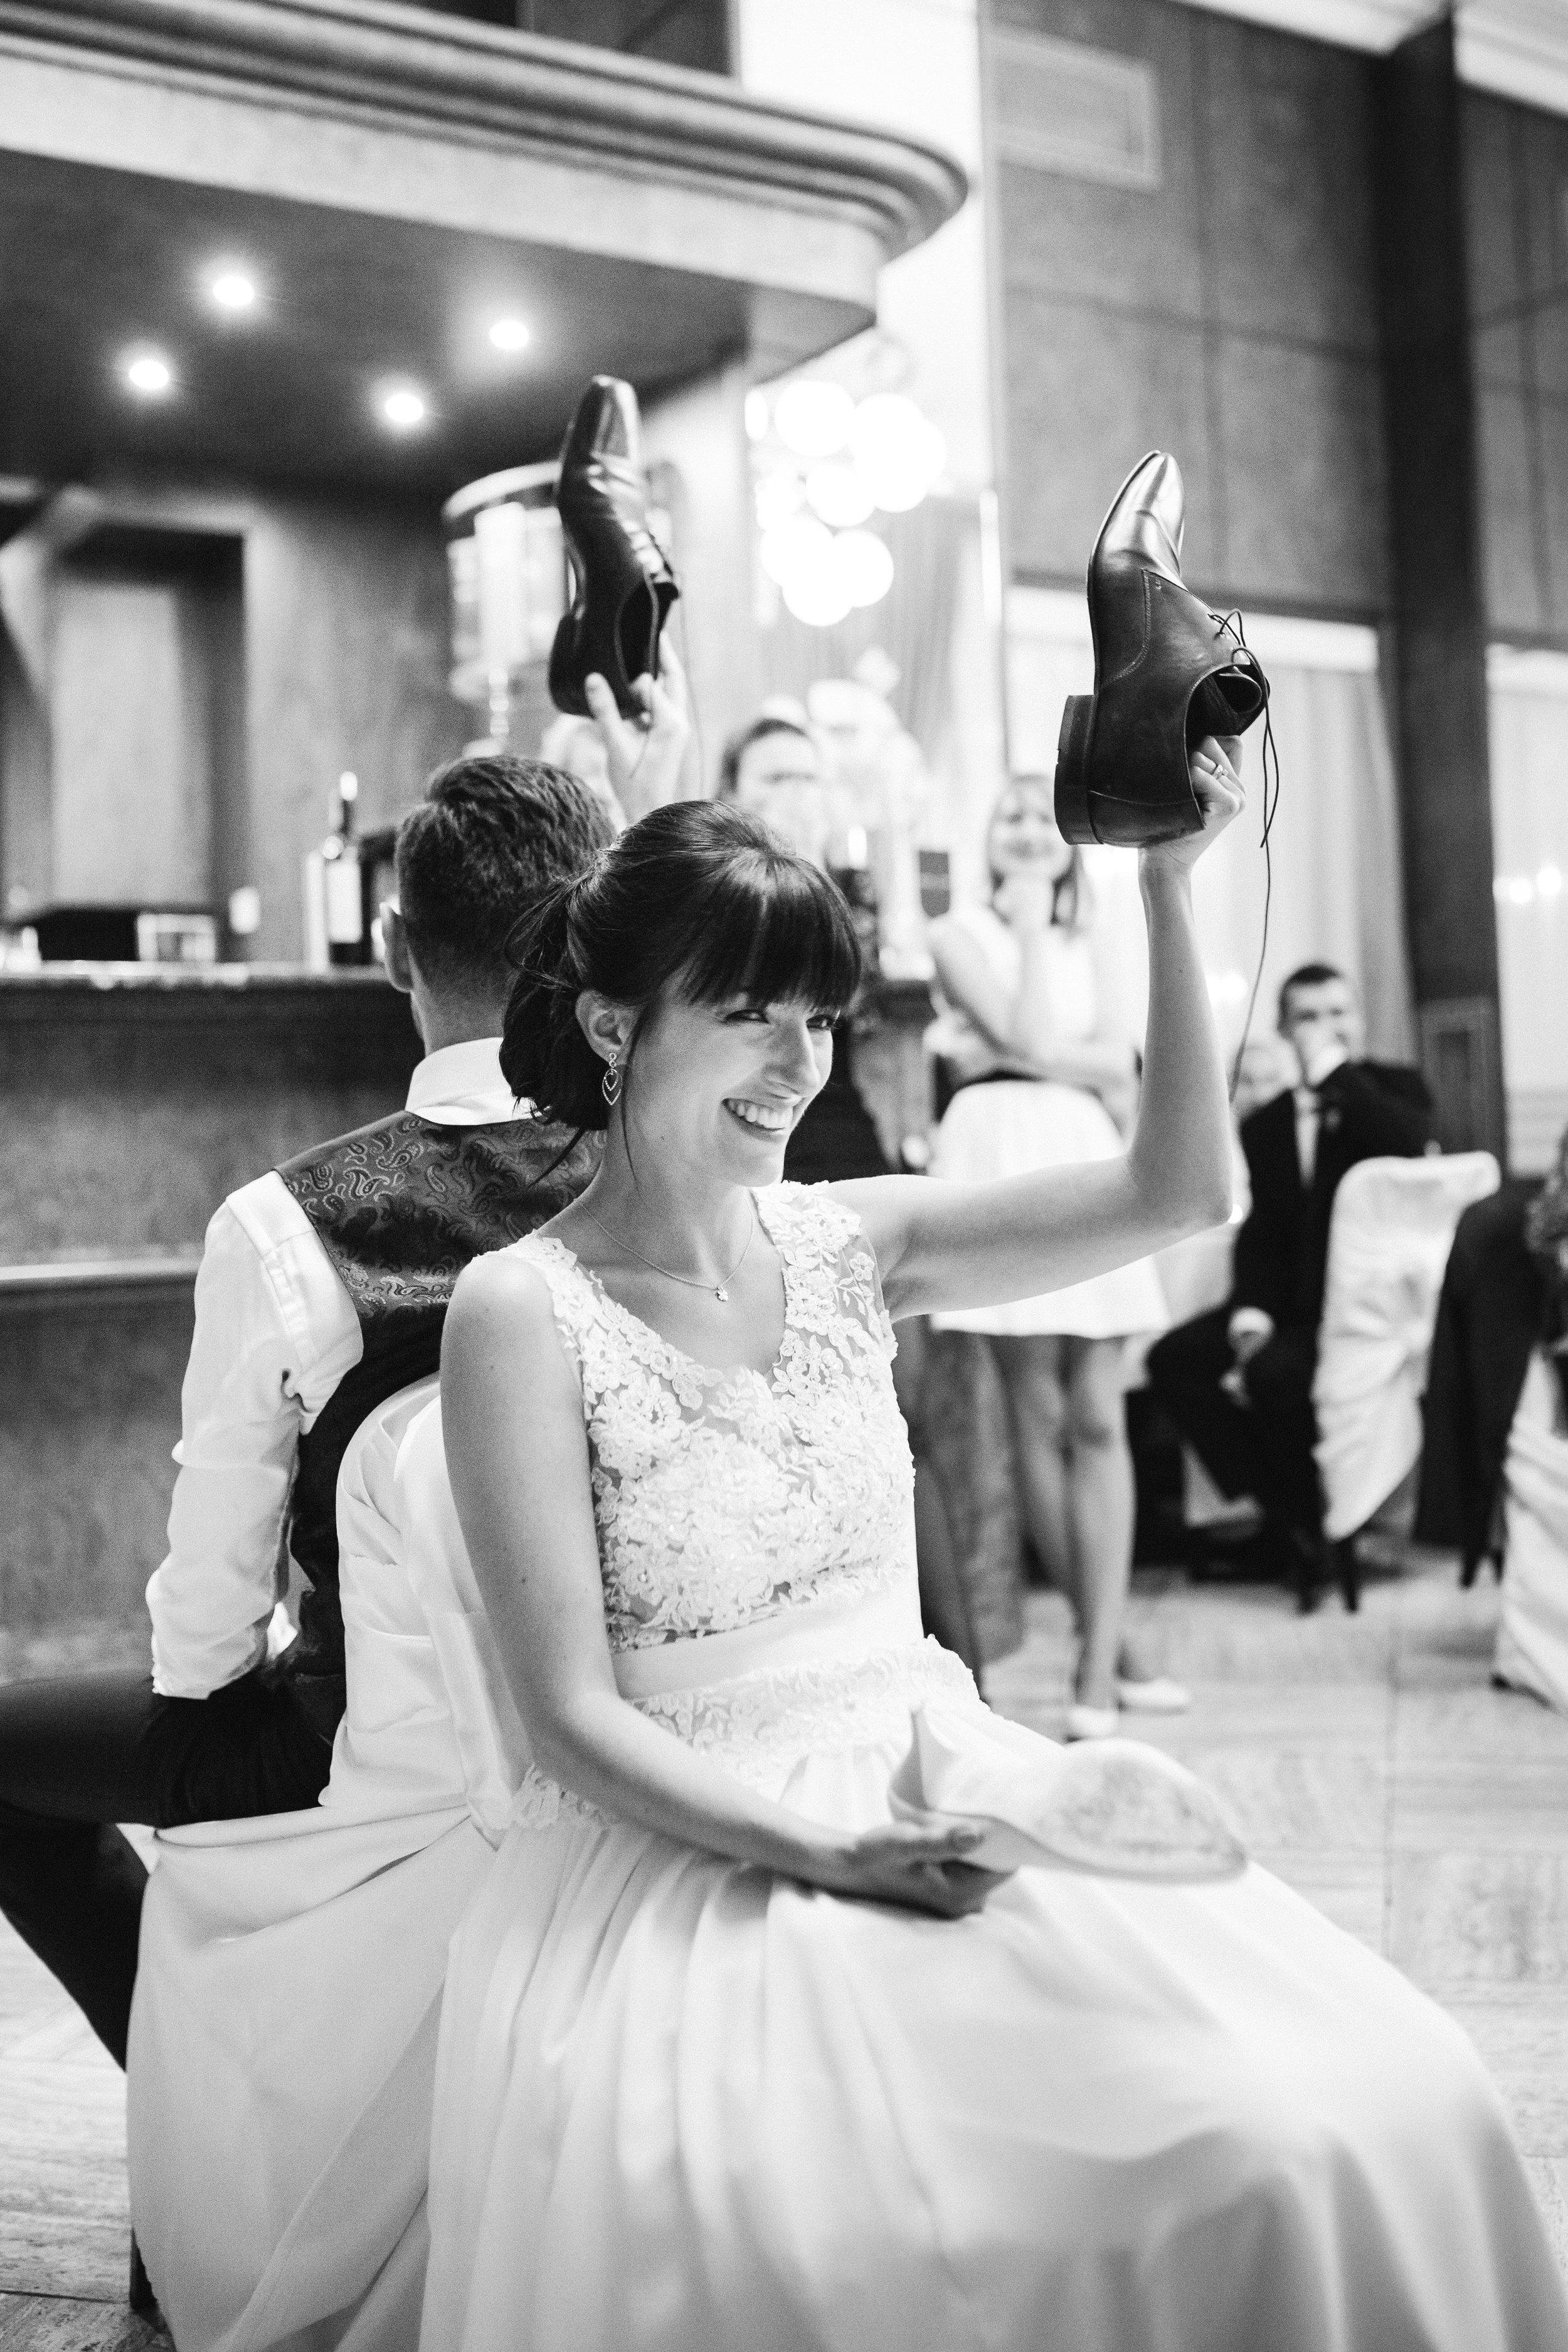 destination-wedding-photographer-slovakia-bratislava-bw-documentary-style-reception-1.jpg